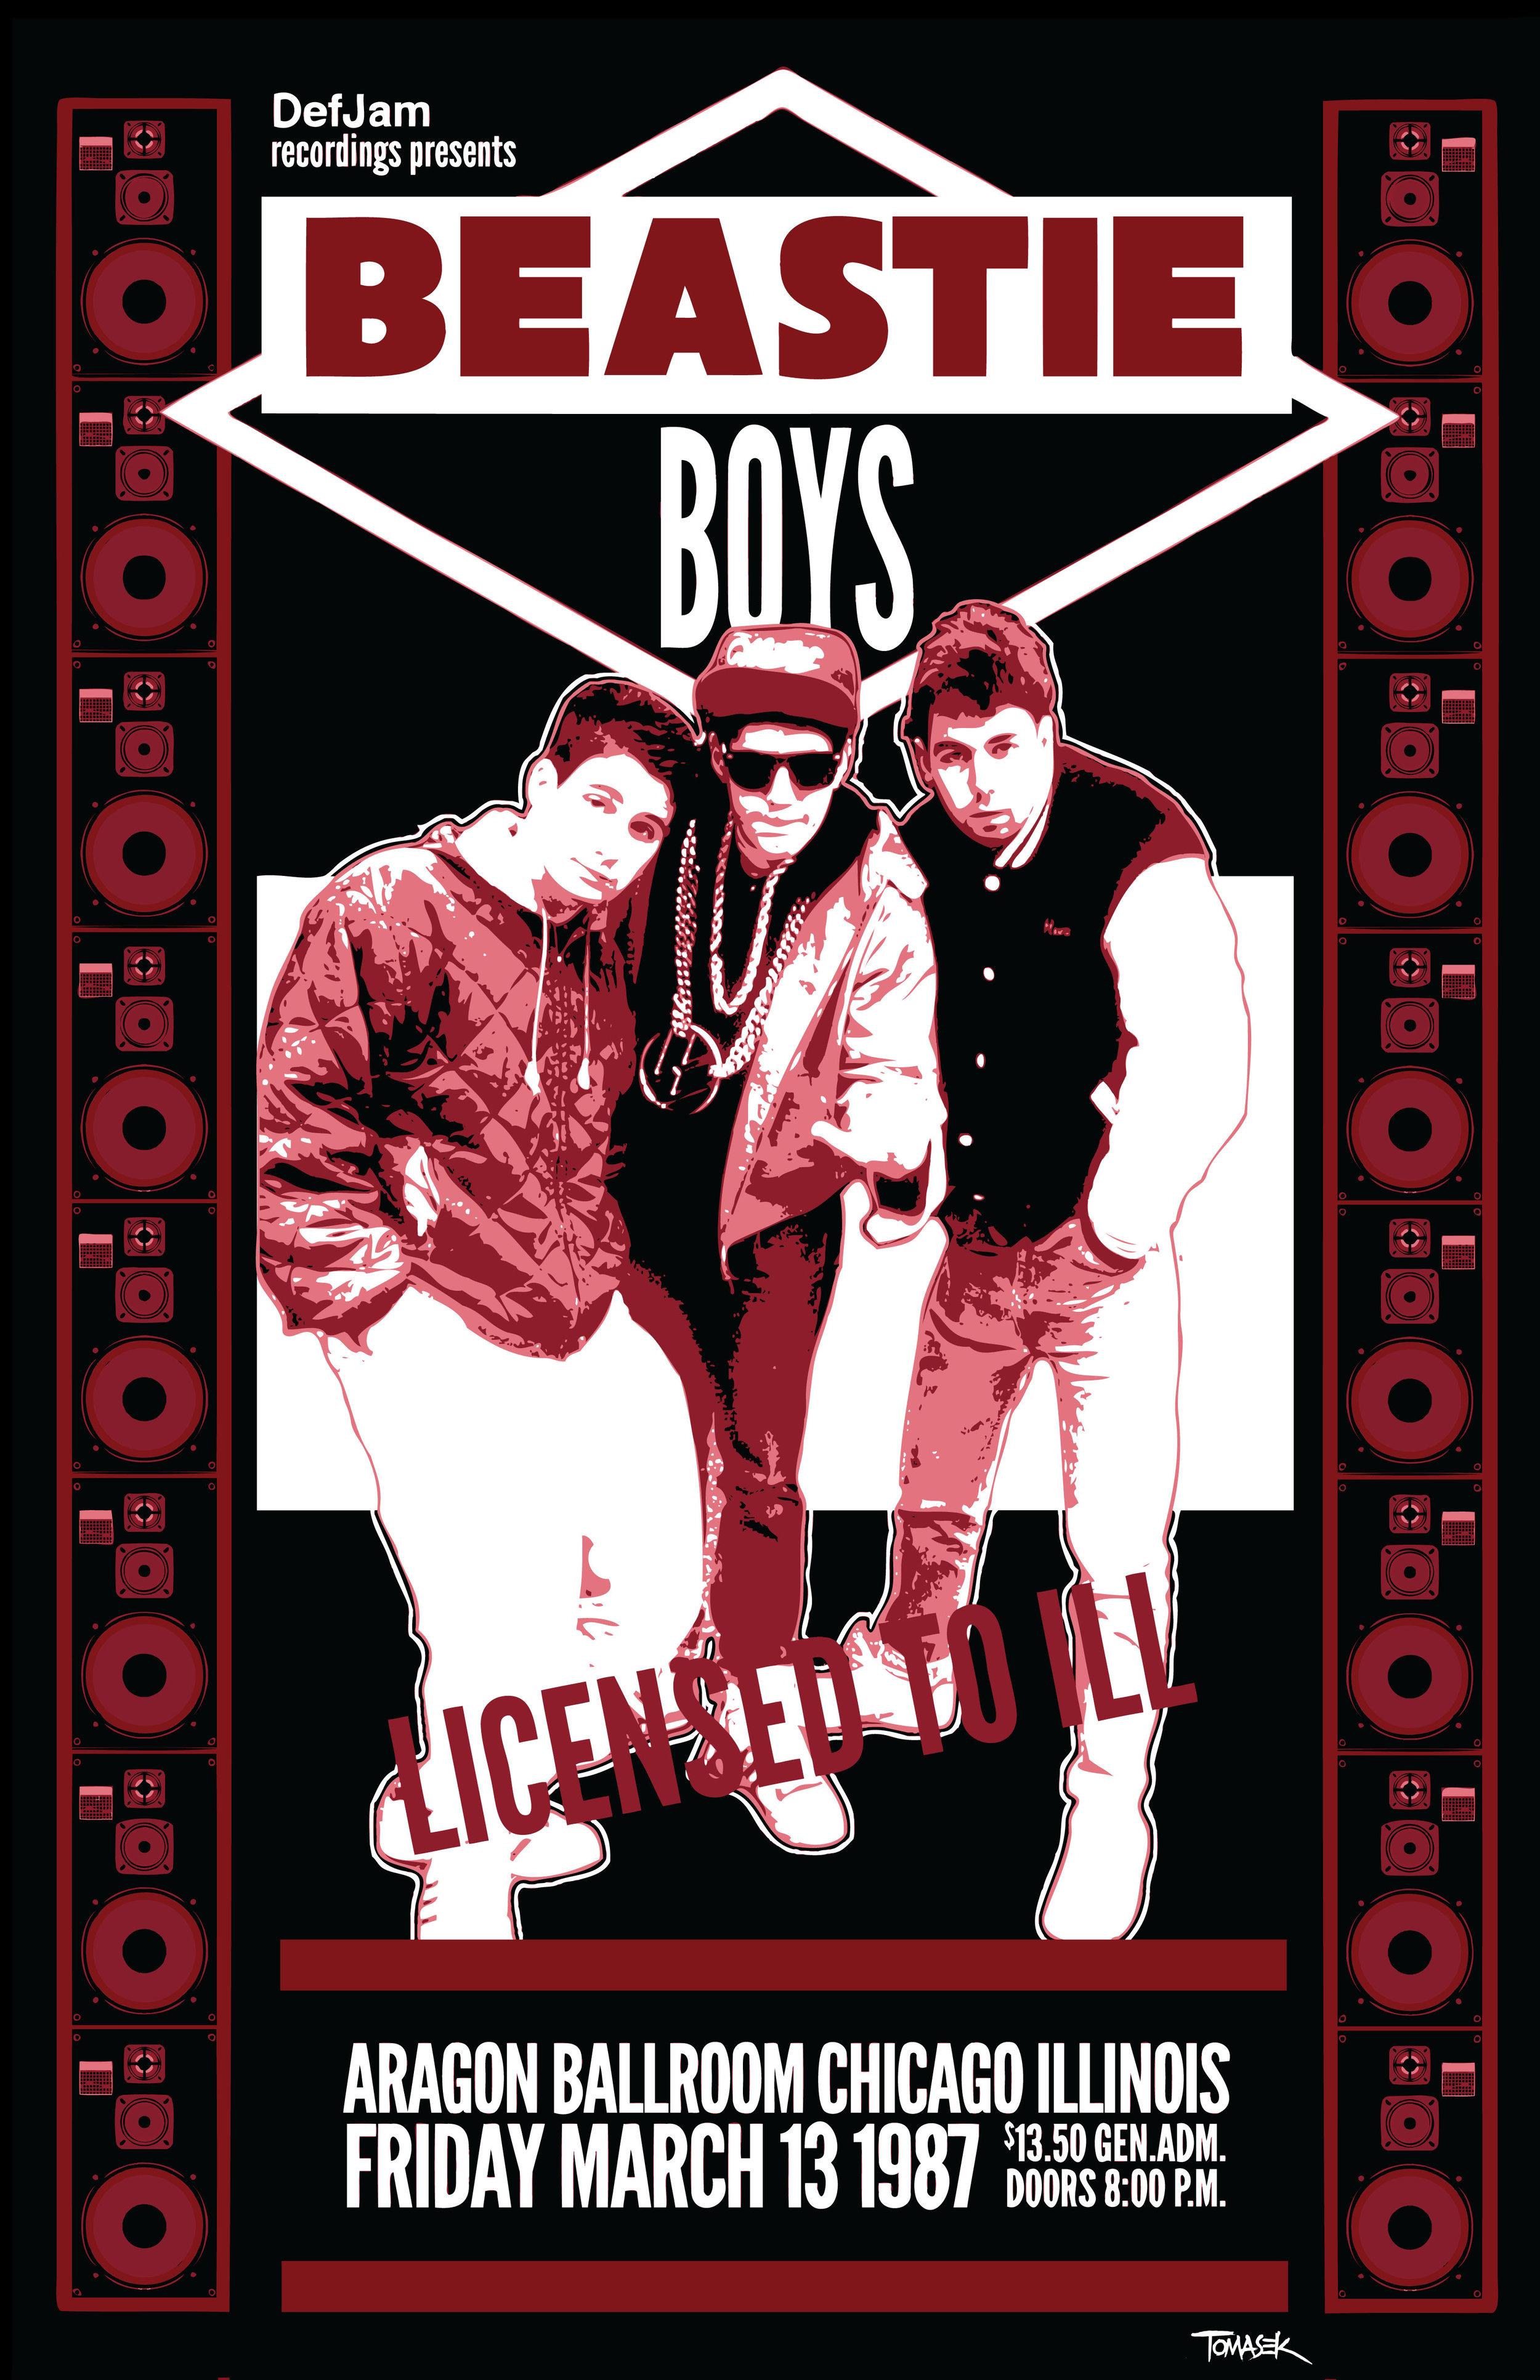 beastie boys 11 x 17 concert poster the artworks of dean tomasek